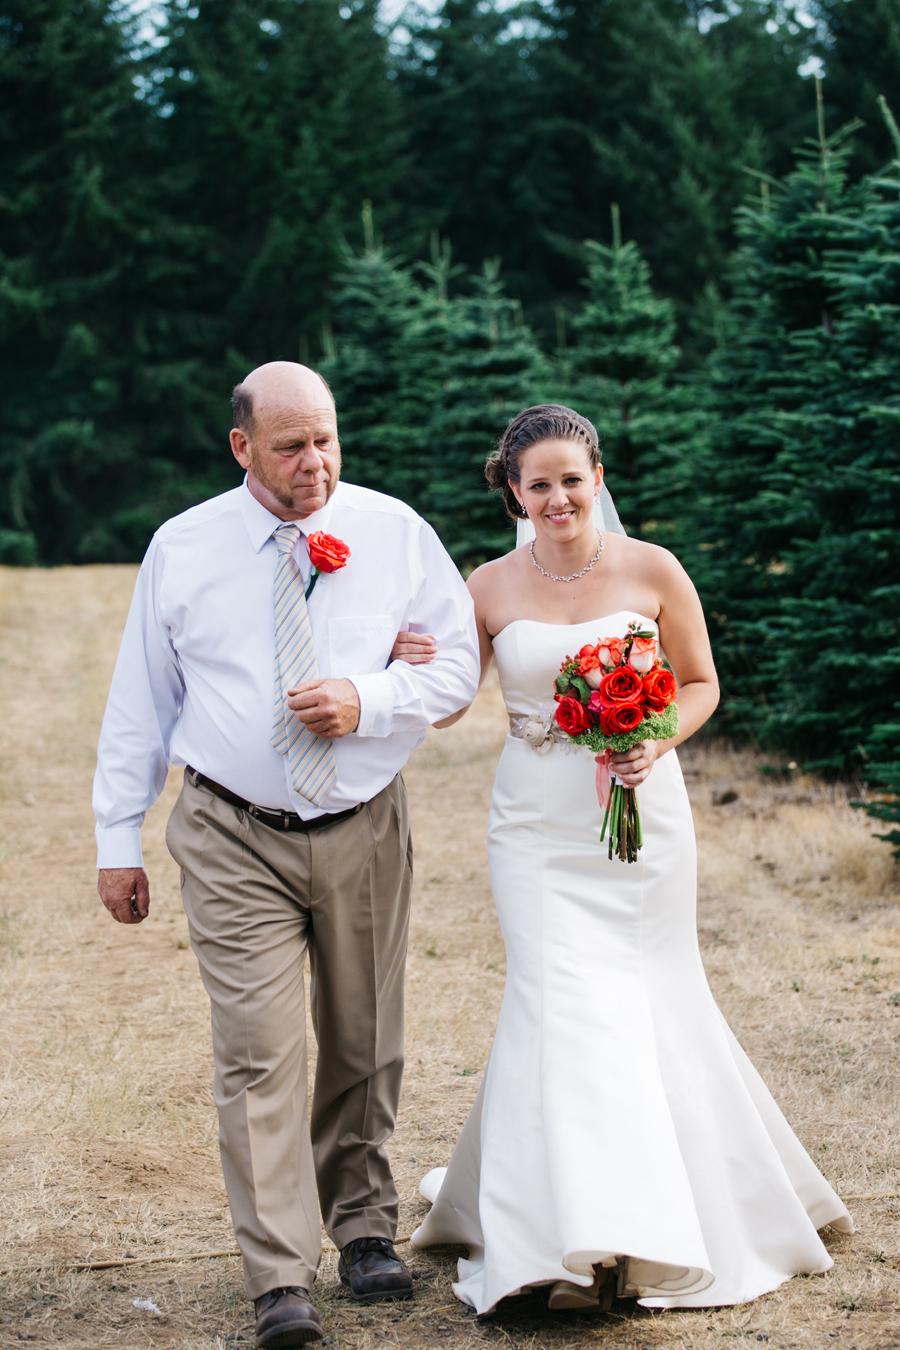 075-portland-oregon-silverton-tree-farm-wedding-katheryn-moran-photography.jpg